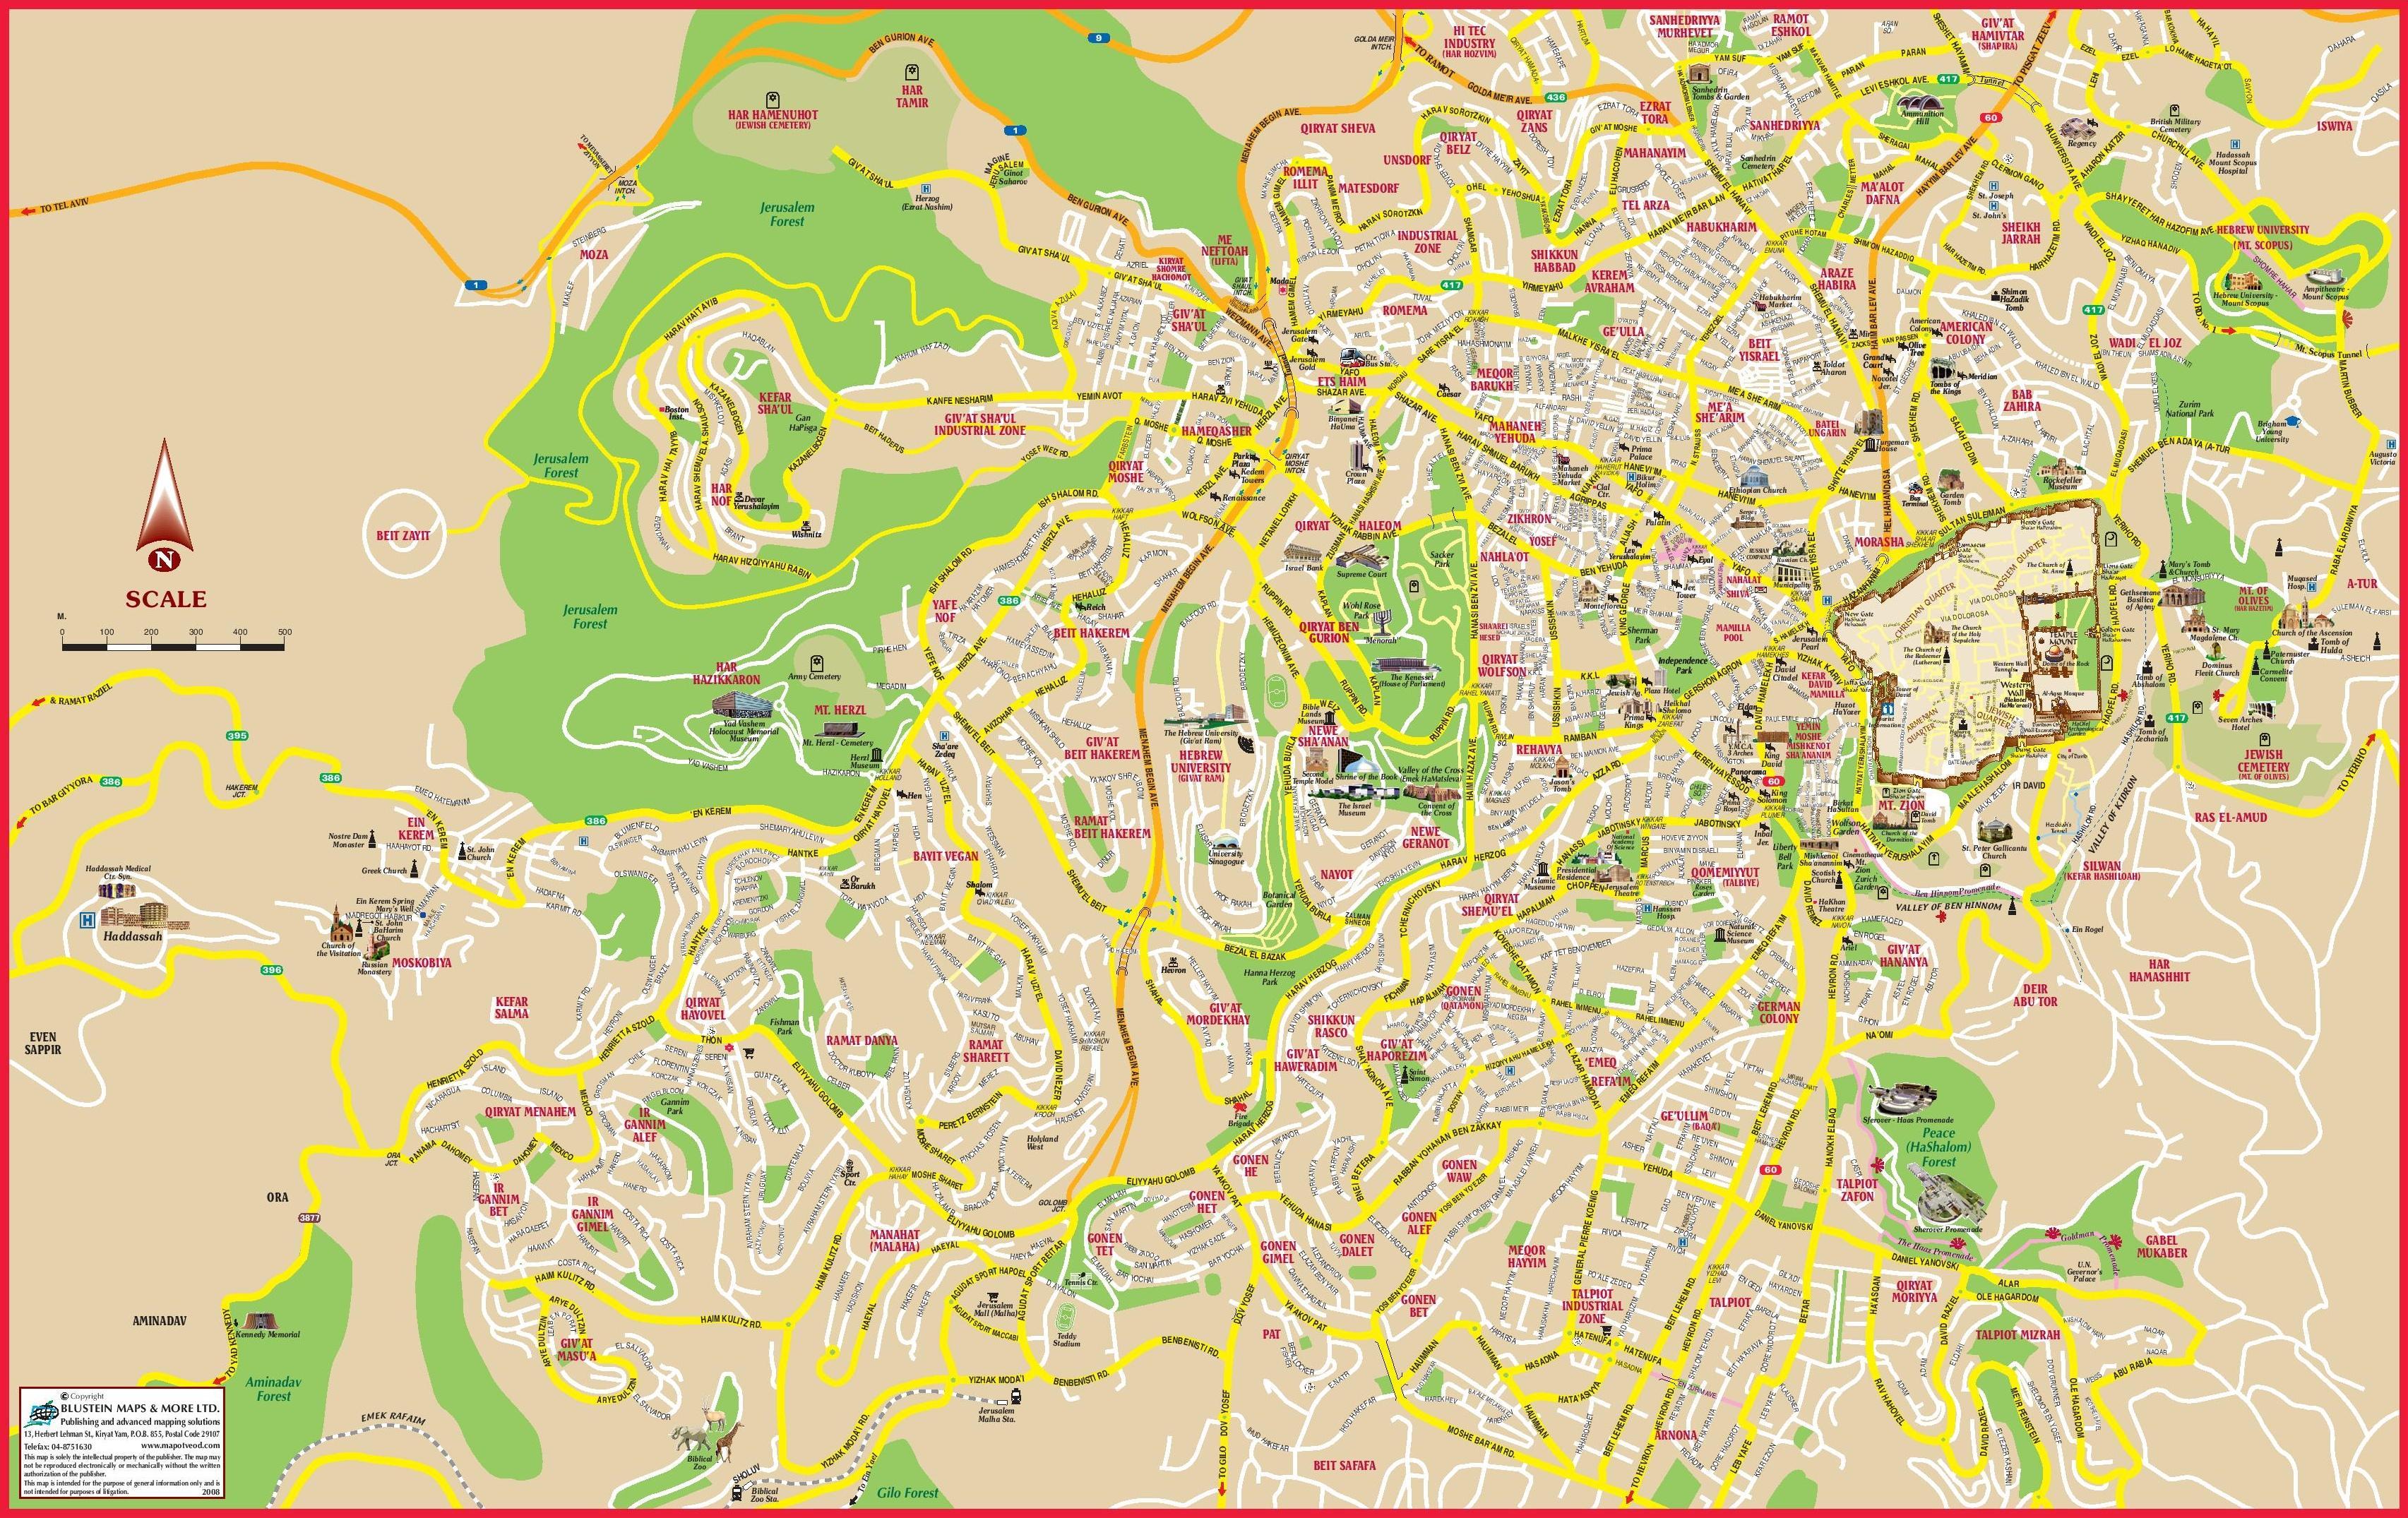 Jerusalem Karte Heute.Jerusalem Heute Map Karte Von Jerusalem Heute Israel